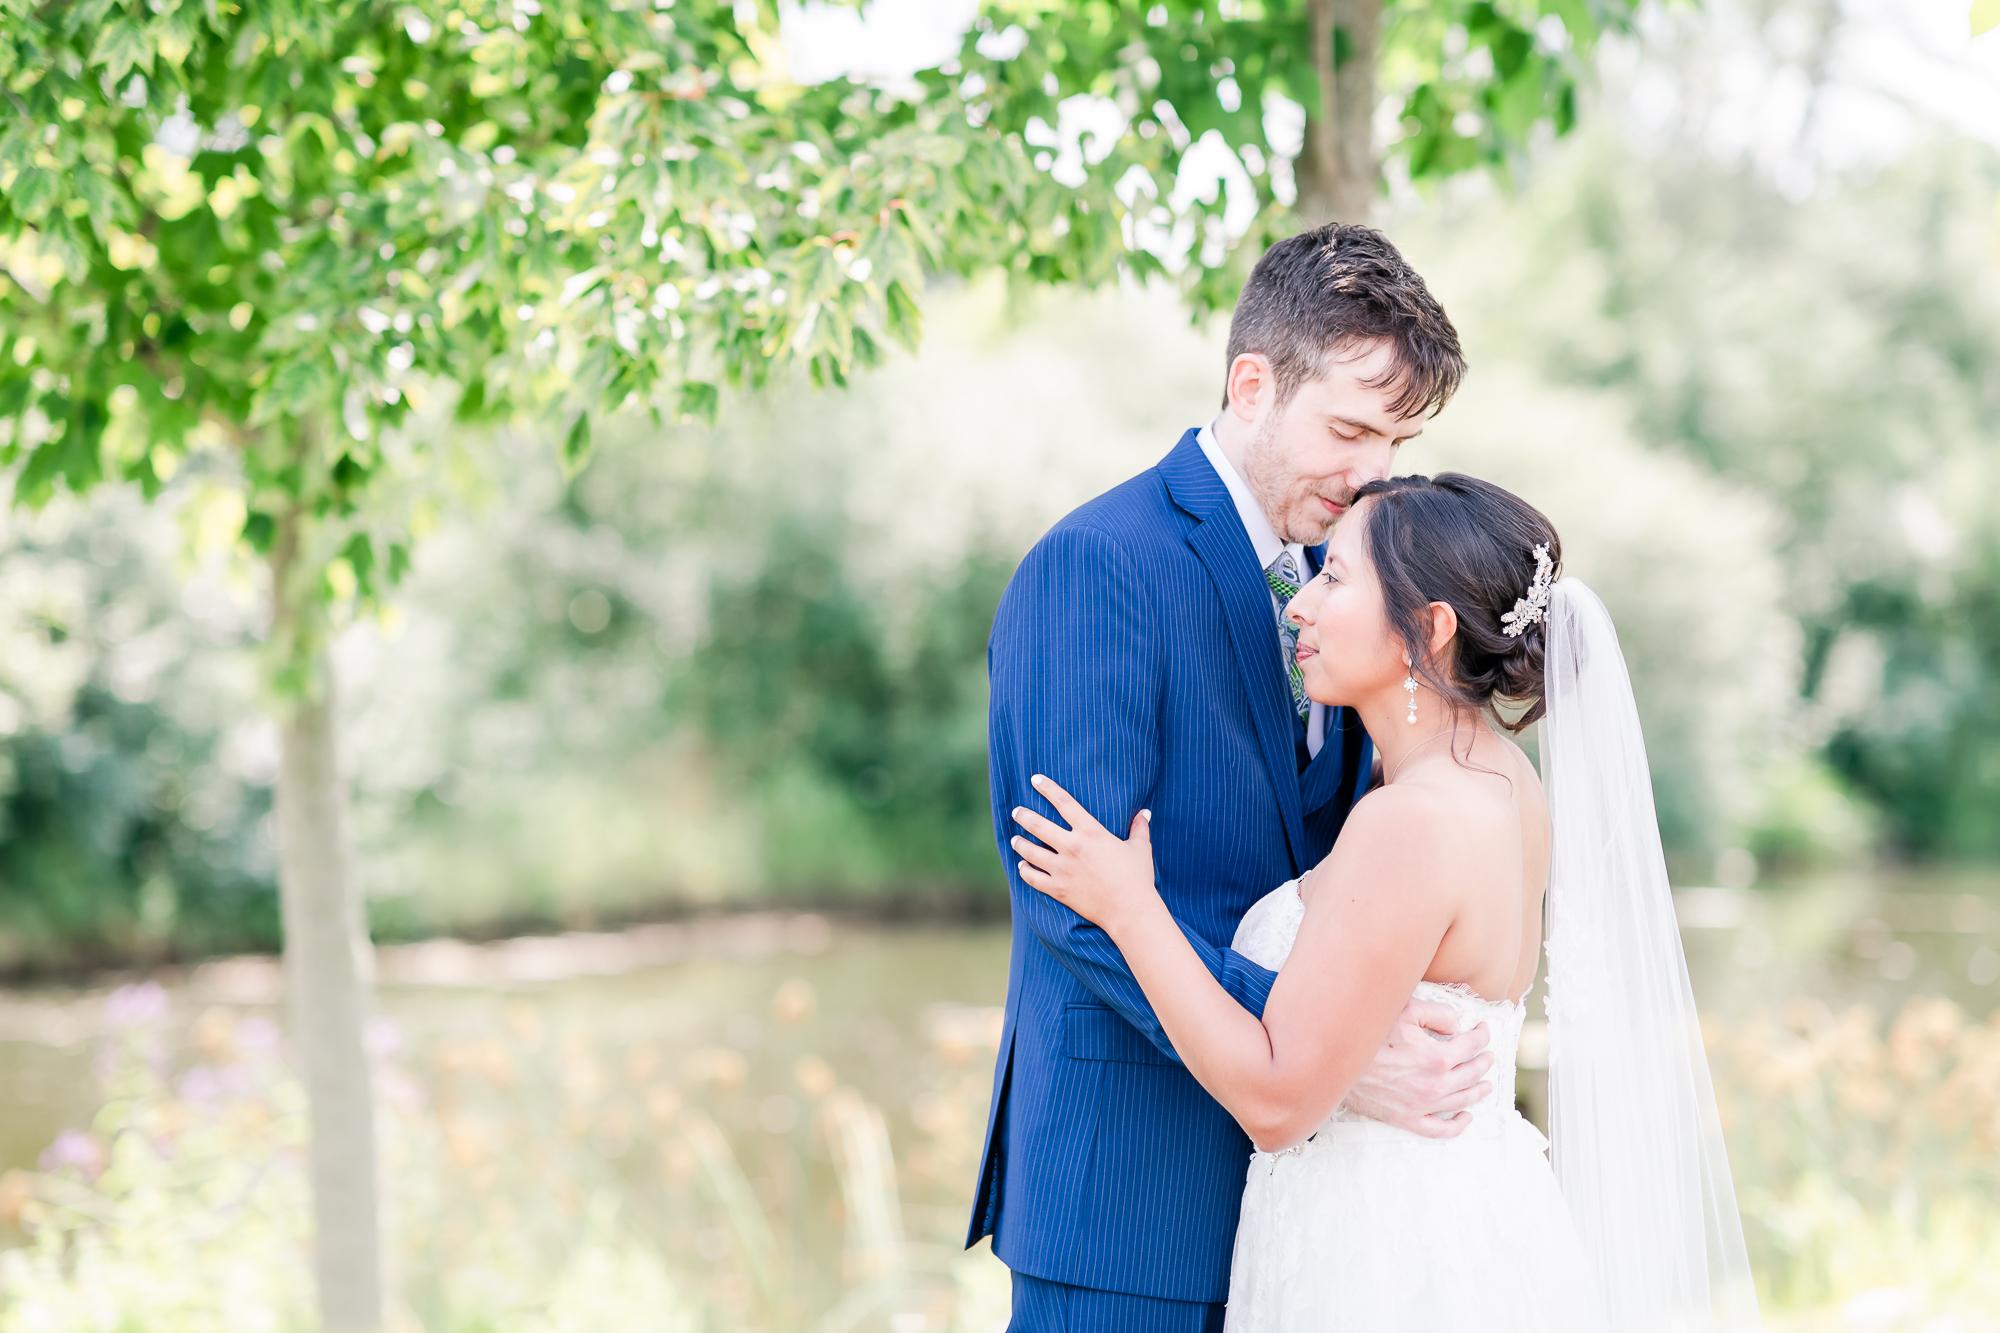 Maria+Adam_Summer Barn Wedding_The Barn and The North Star Preserve_Oberlin_Ohio-115.jpg